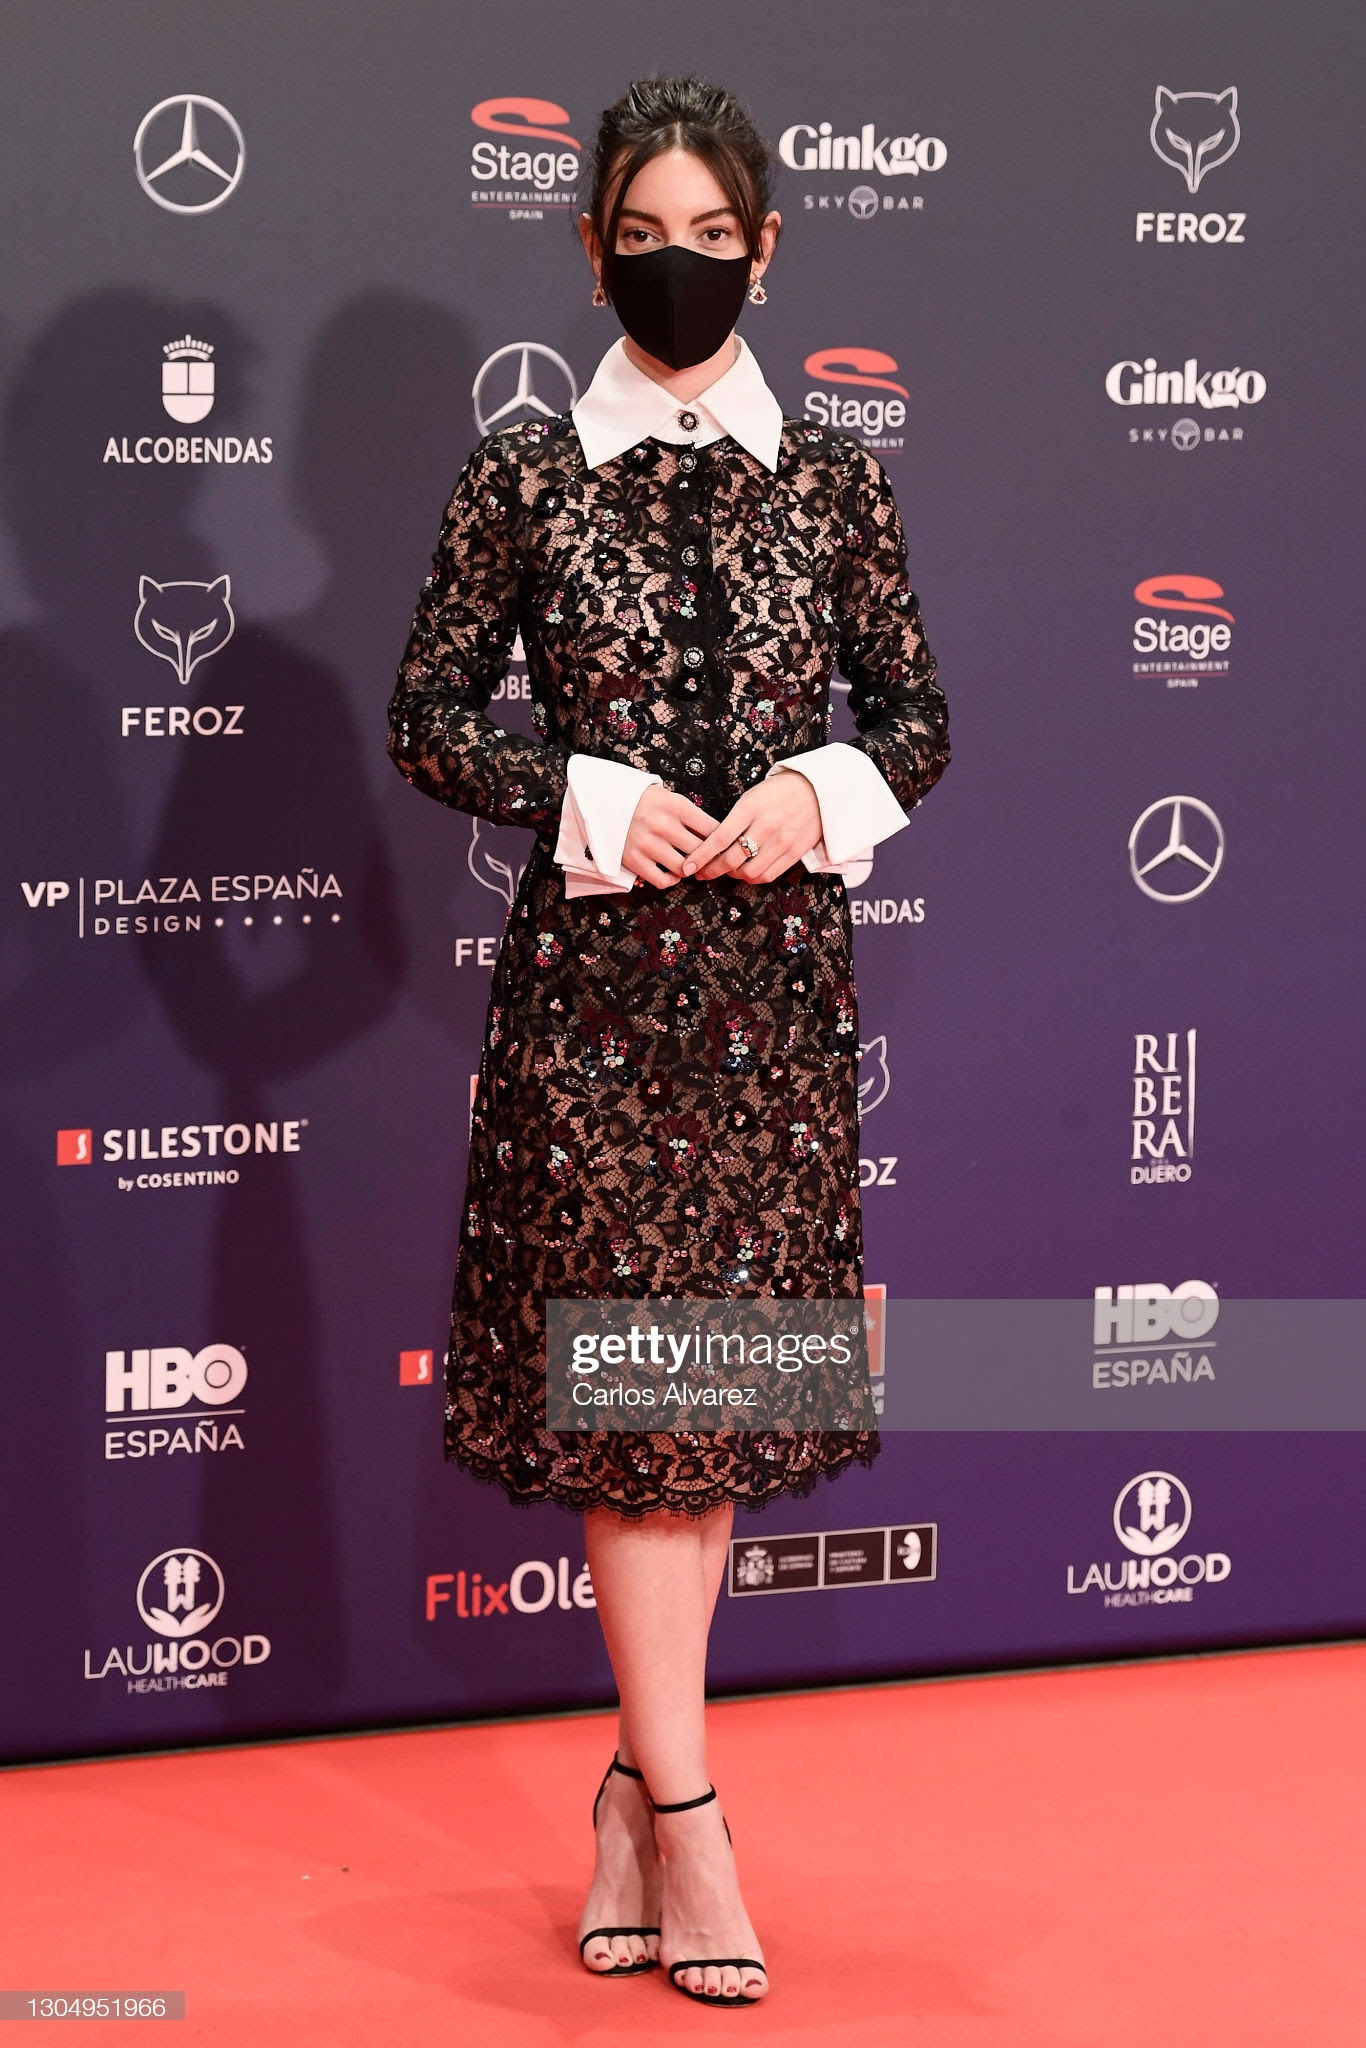 46b969dd 9647 40e3 9e50 a0d1e7065825 - Todas las celebrities que escogieron Jimmy Choo en los Premios Feroz 2021